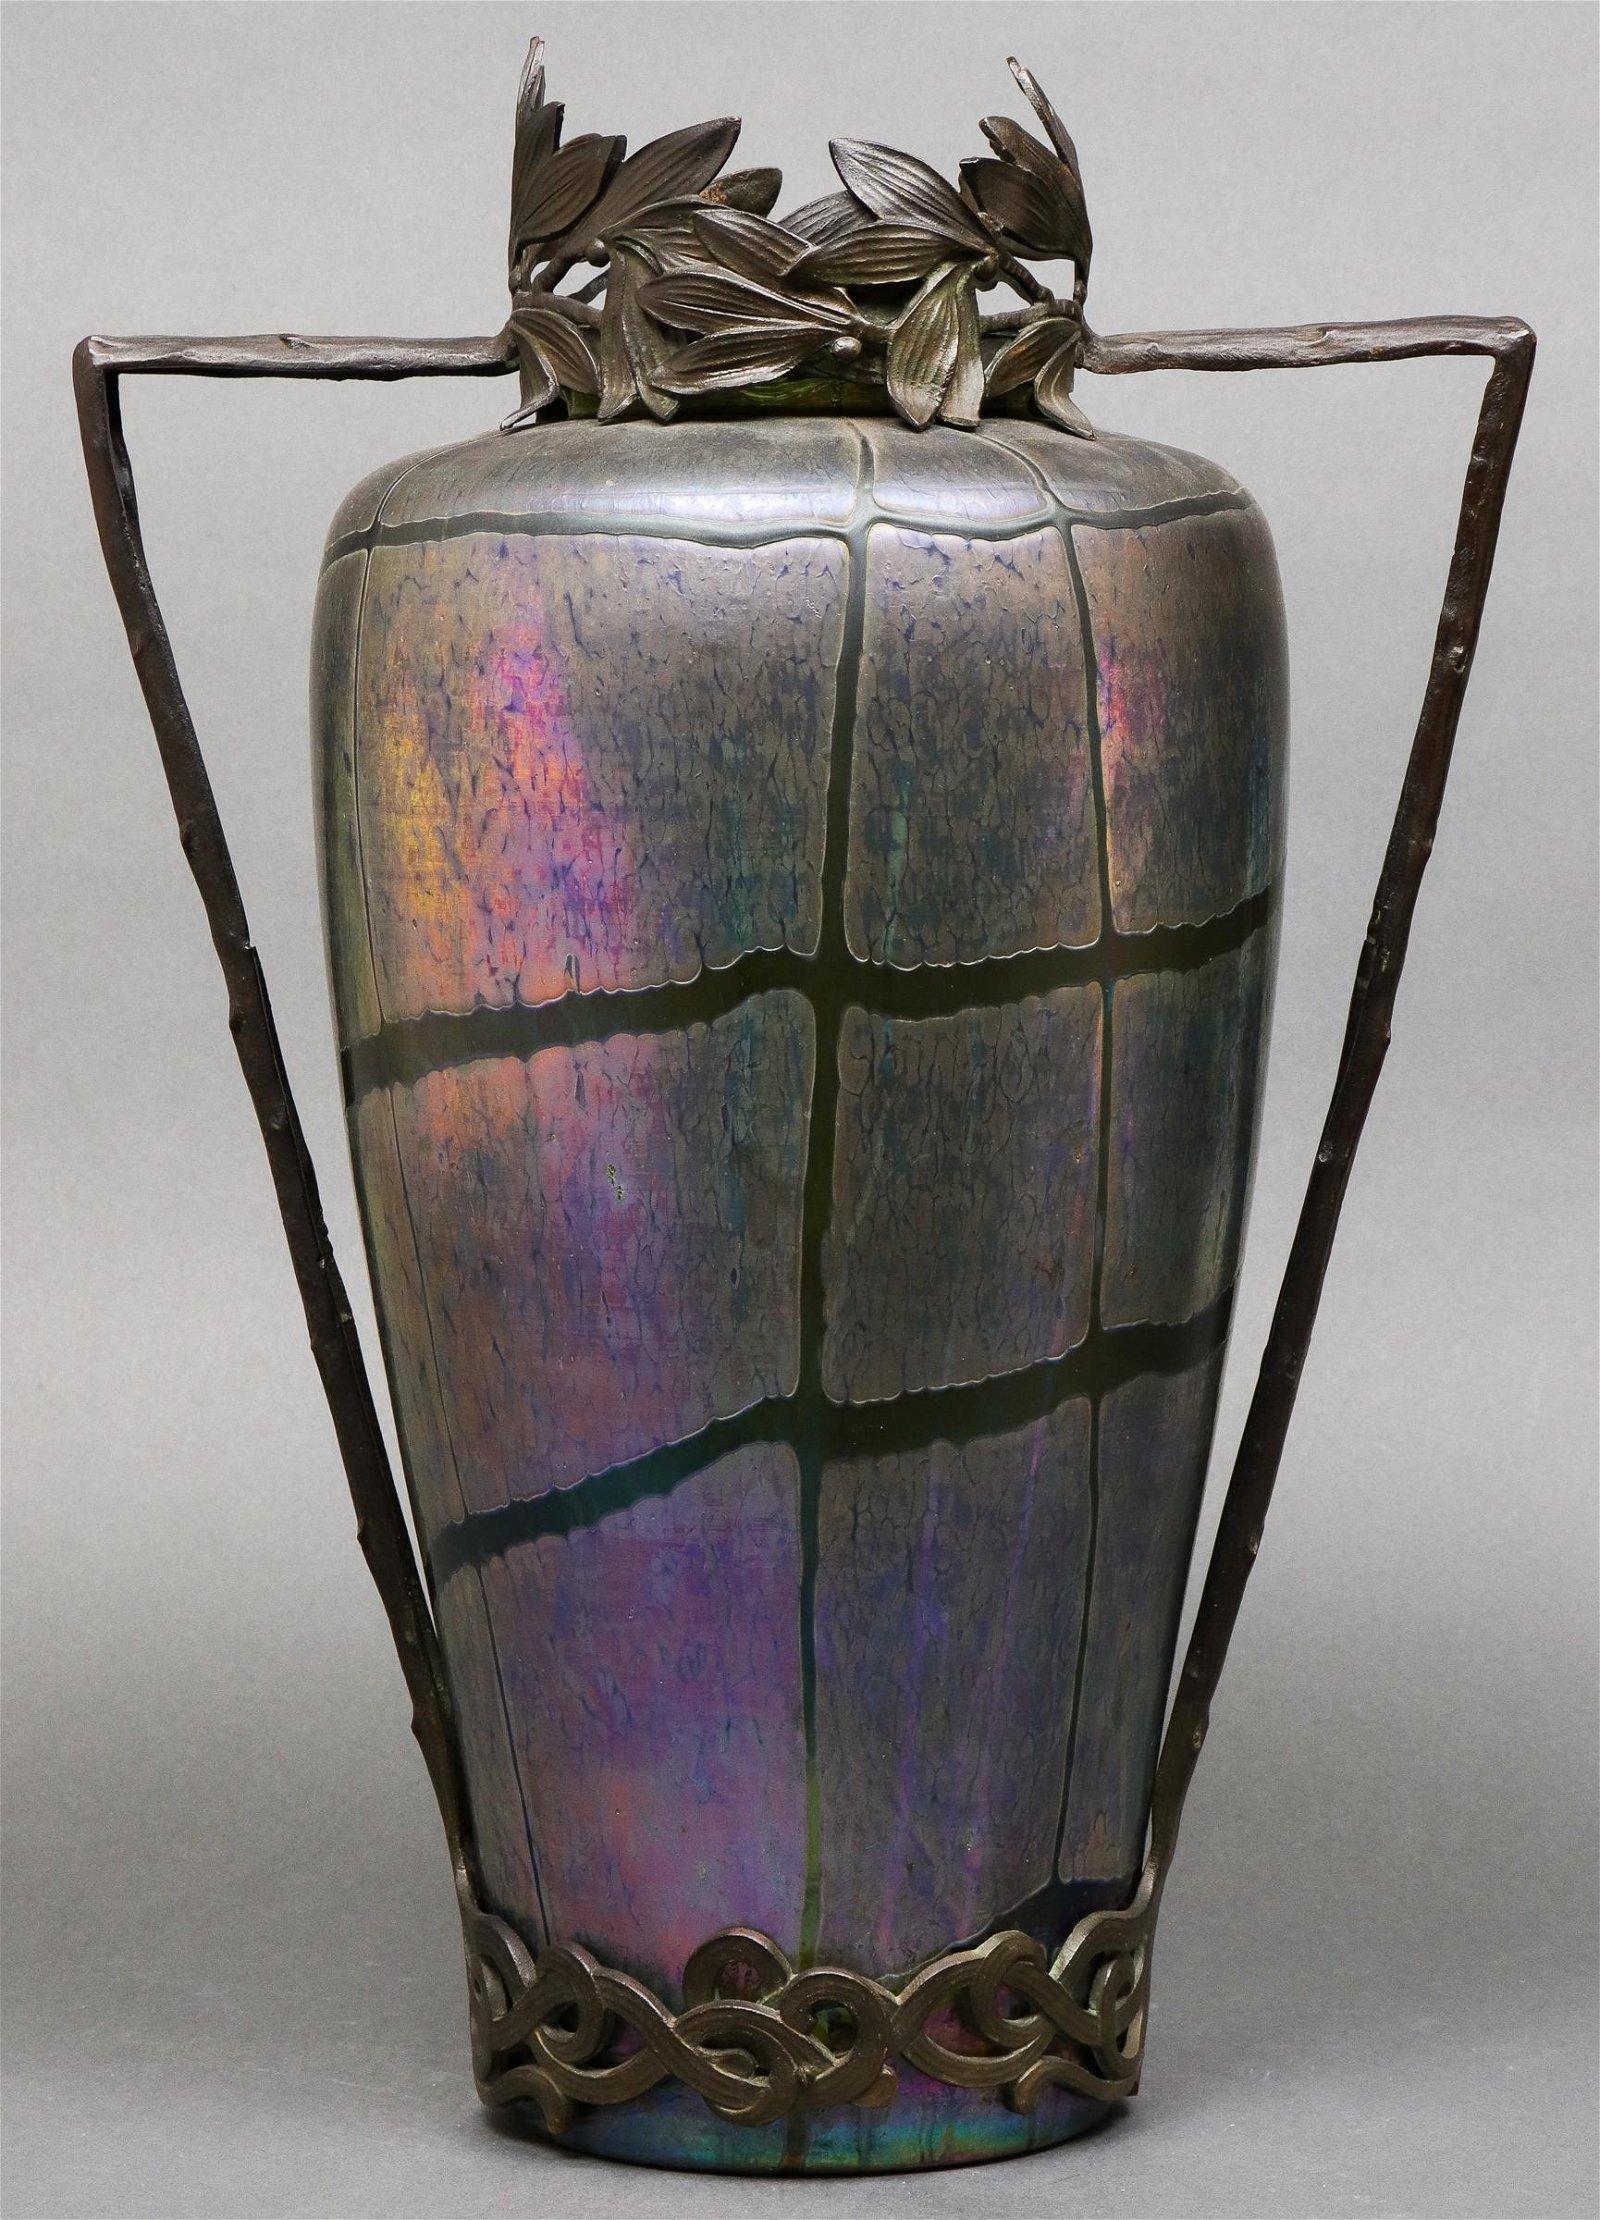 Loetz Attributed Bronze Mounted Iridescent Vase